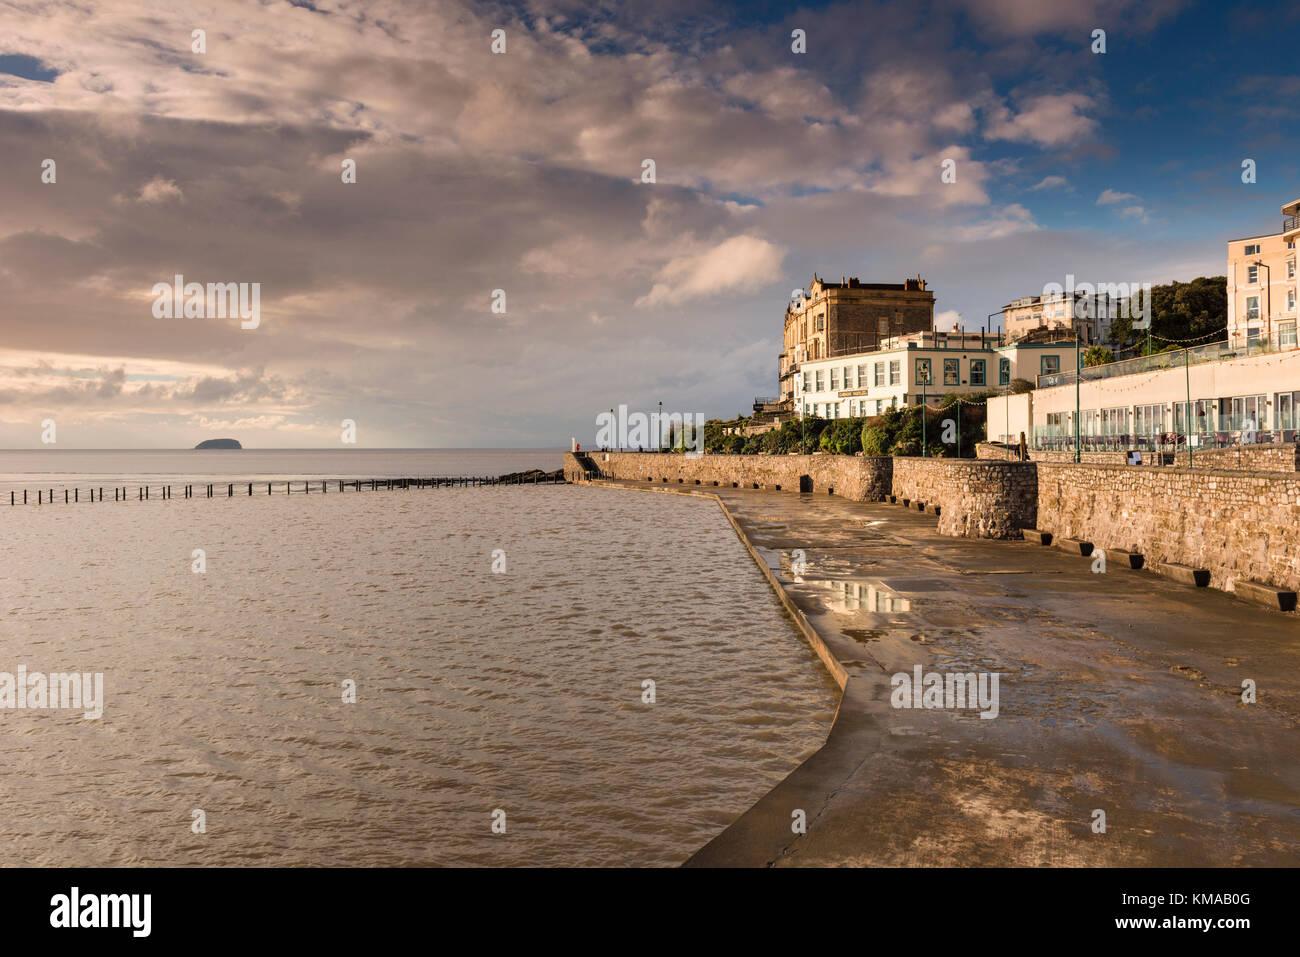 Marine Lake, Weston super Mare, North Somerset, UK - Stock Image